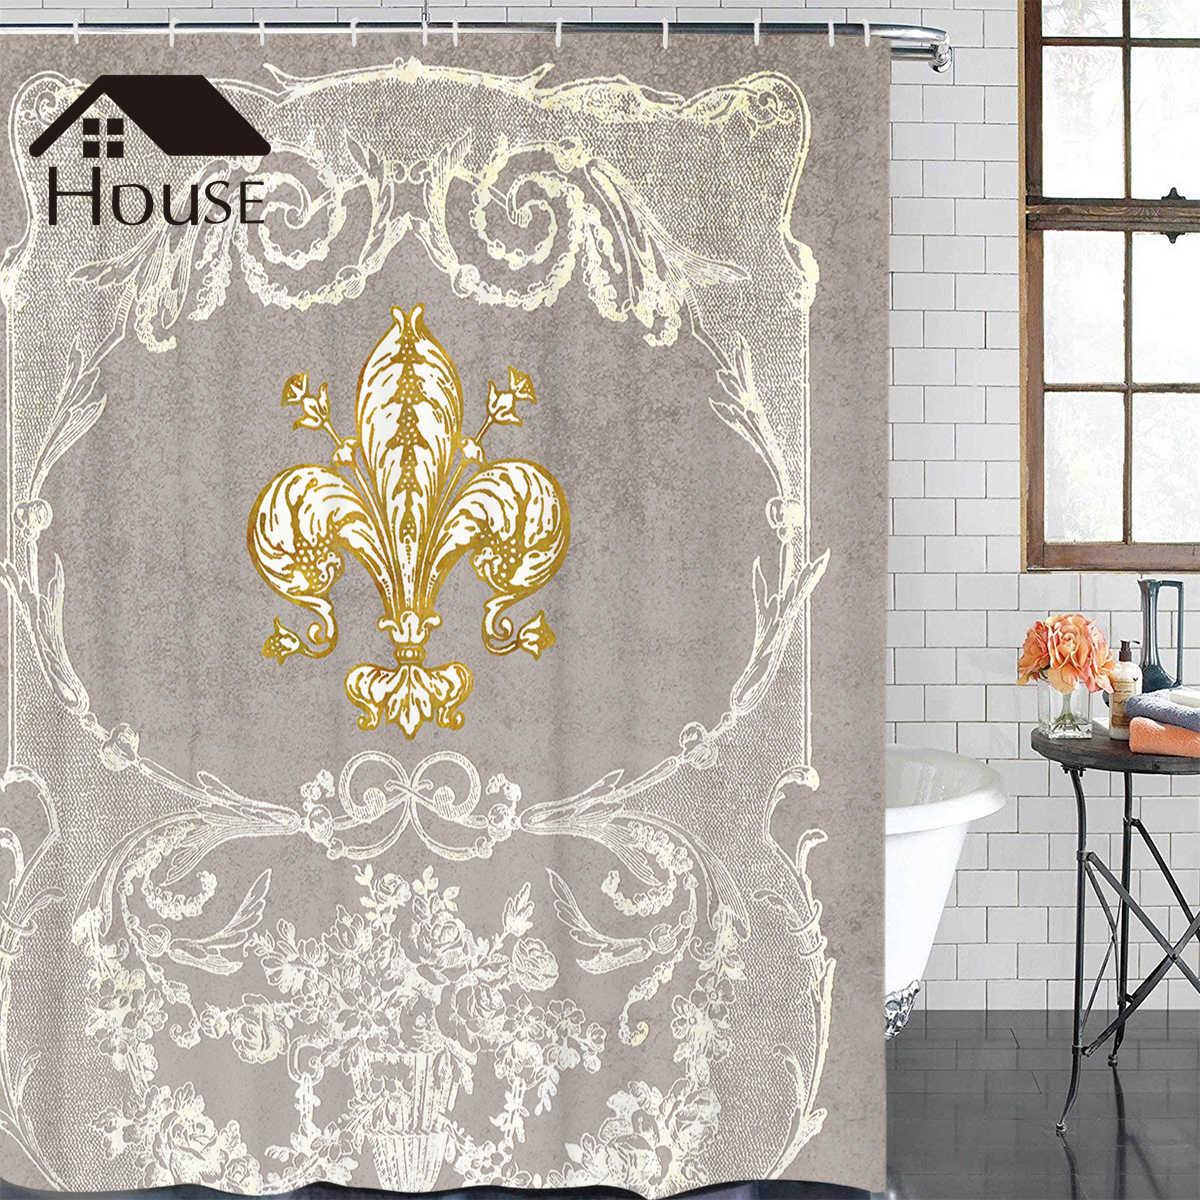 multi size shower curtain fleur de lis fabric bath curtain waterproof bathroom curtains washable 12 hooks